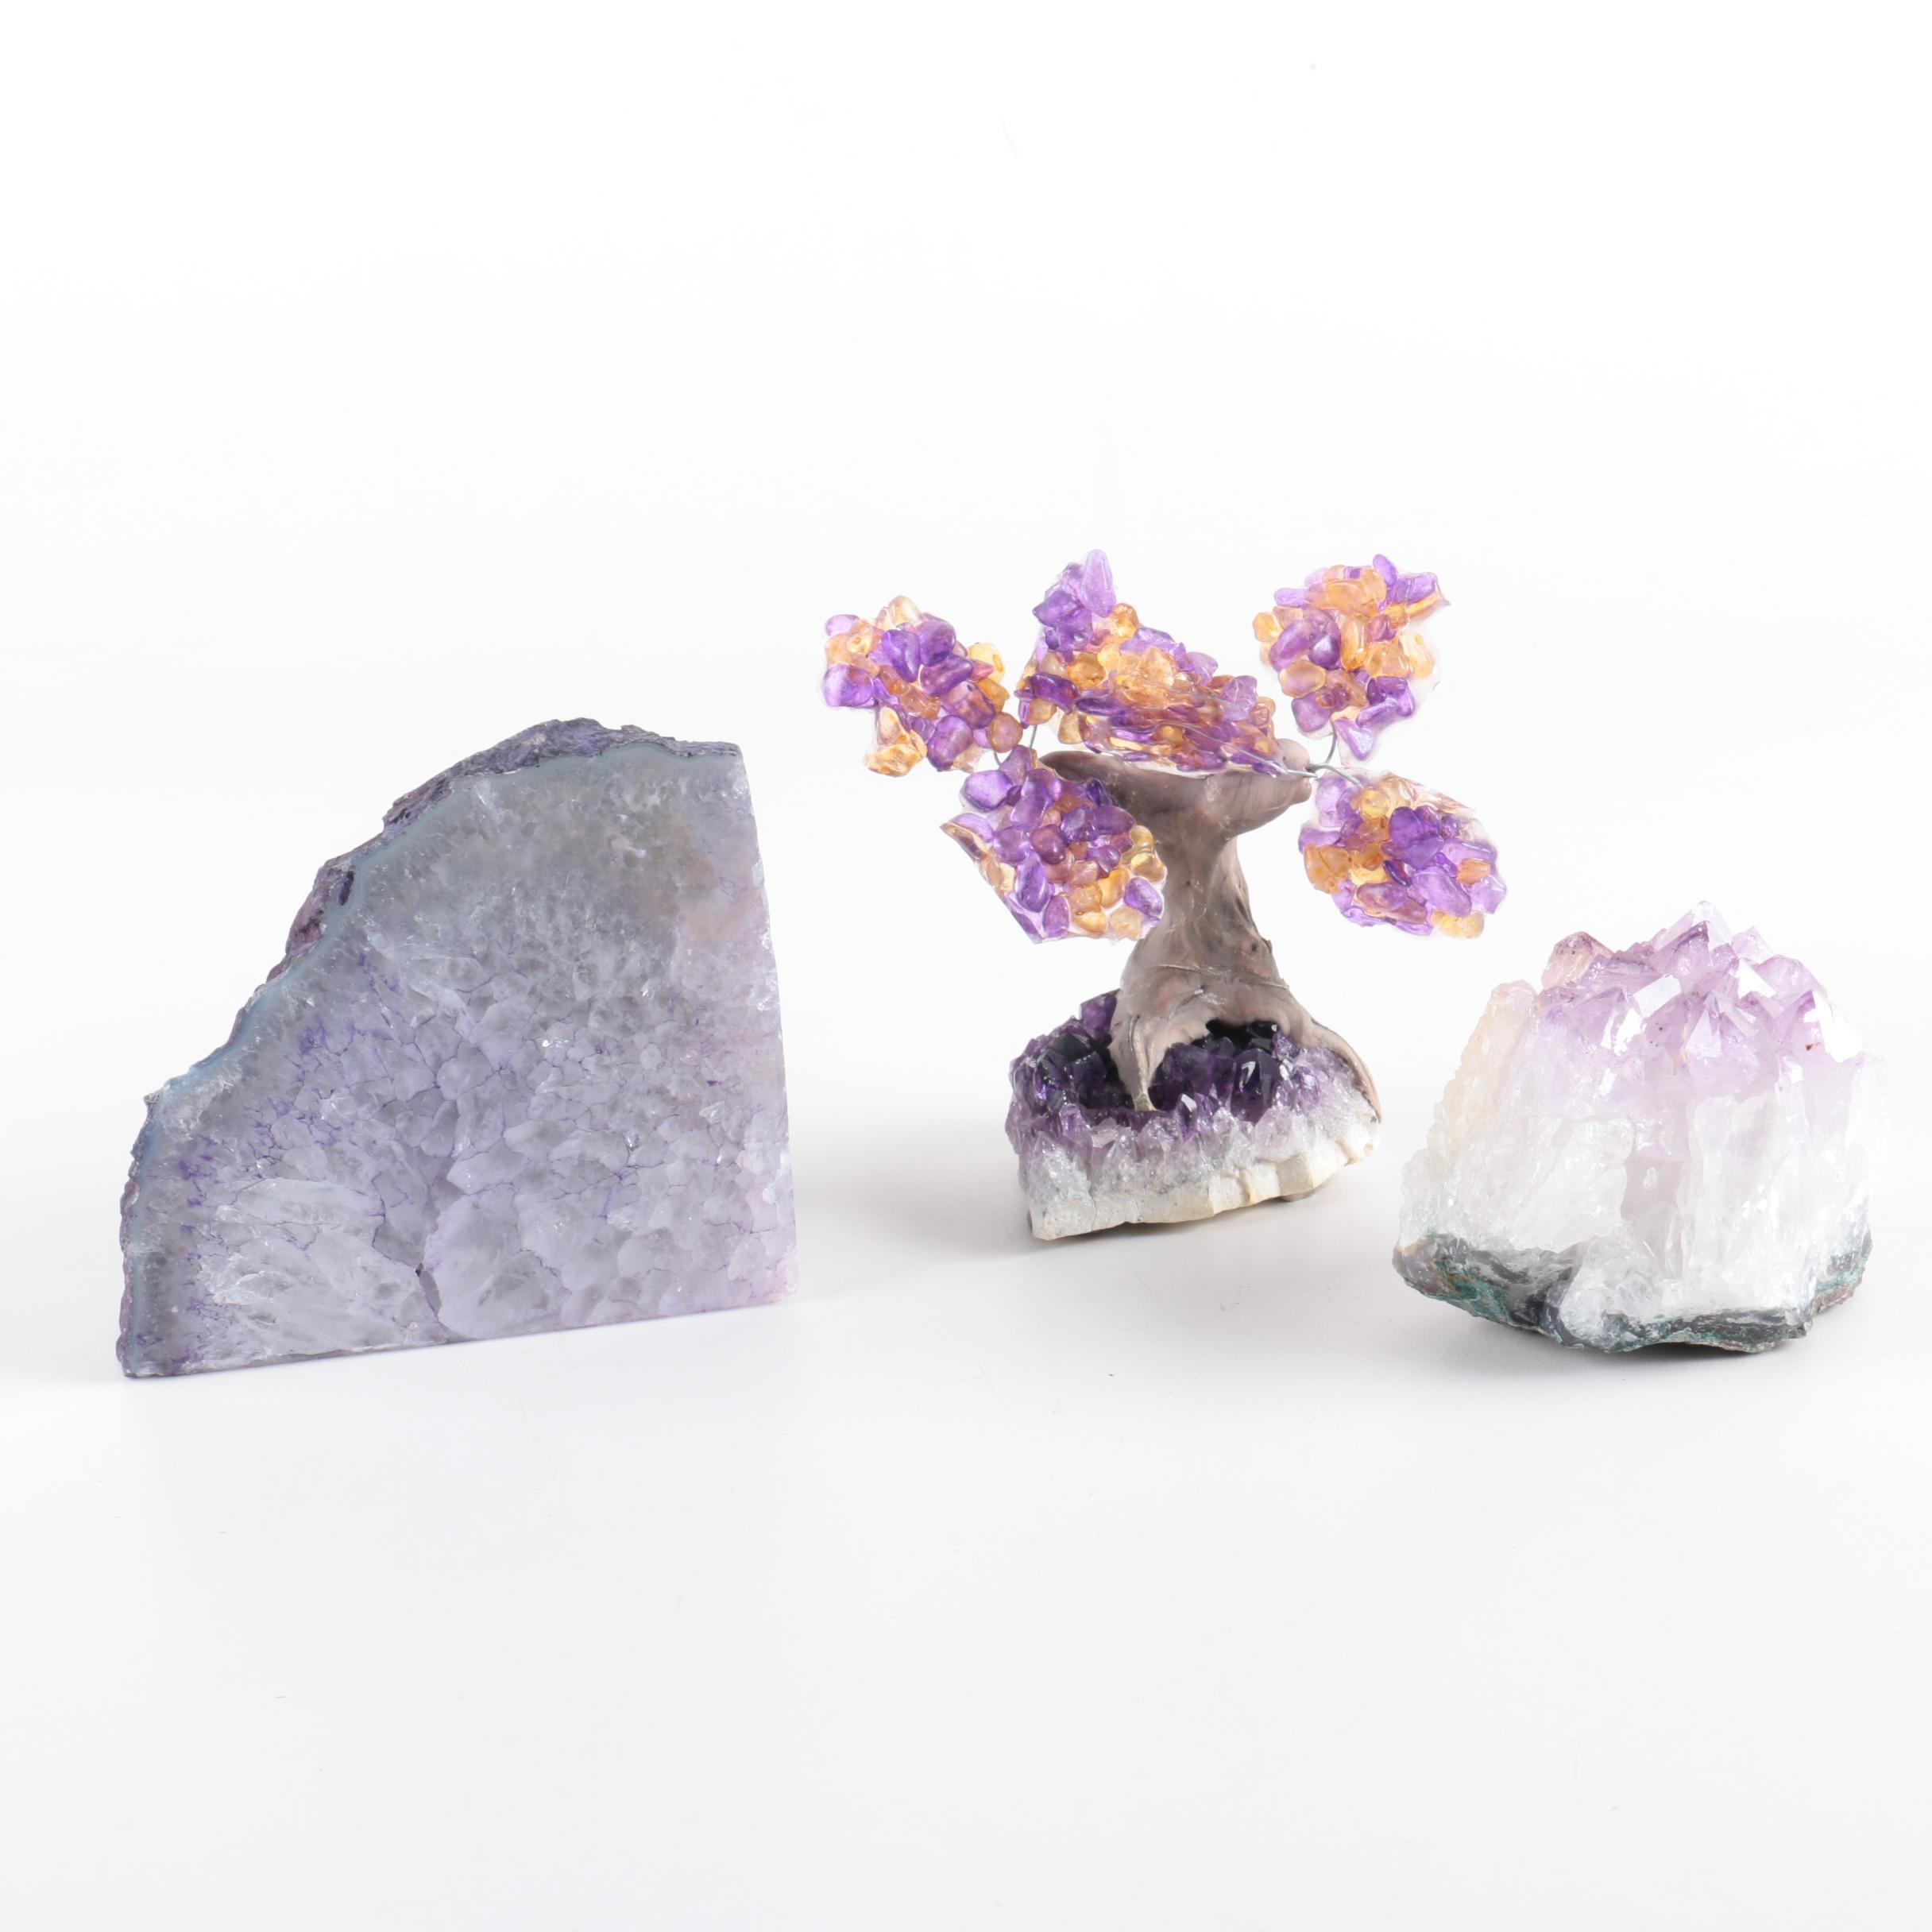 Mineral Specimens